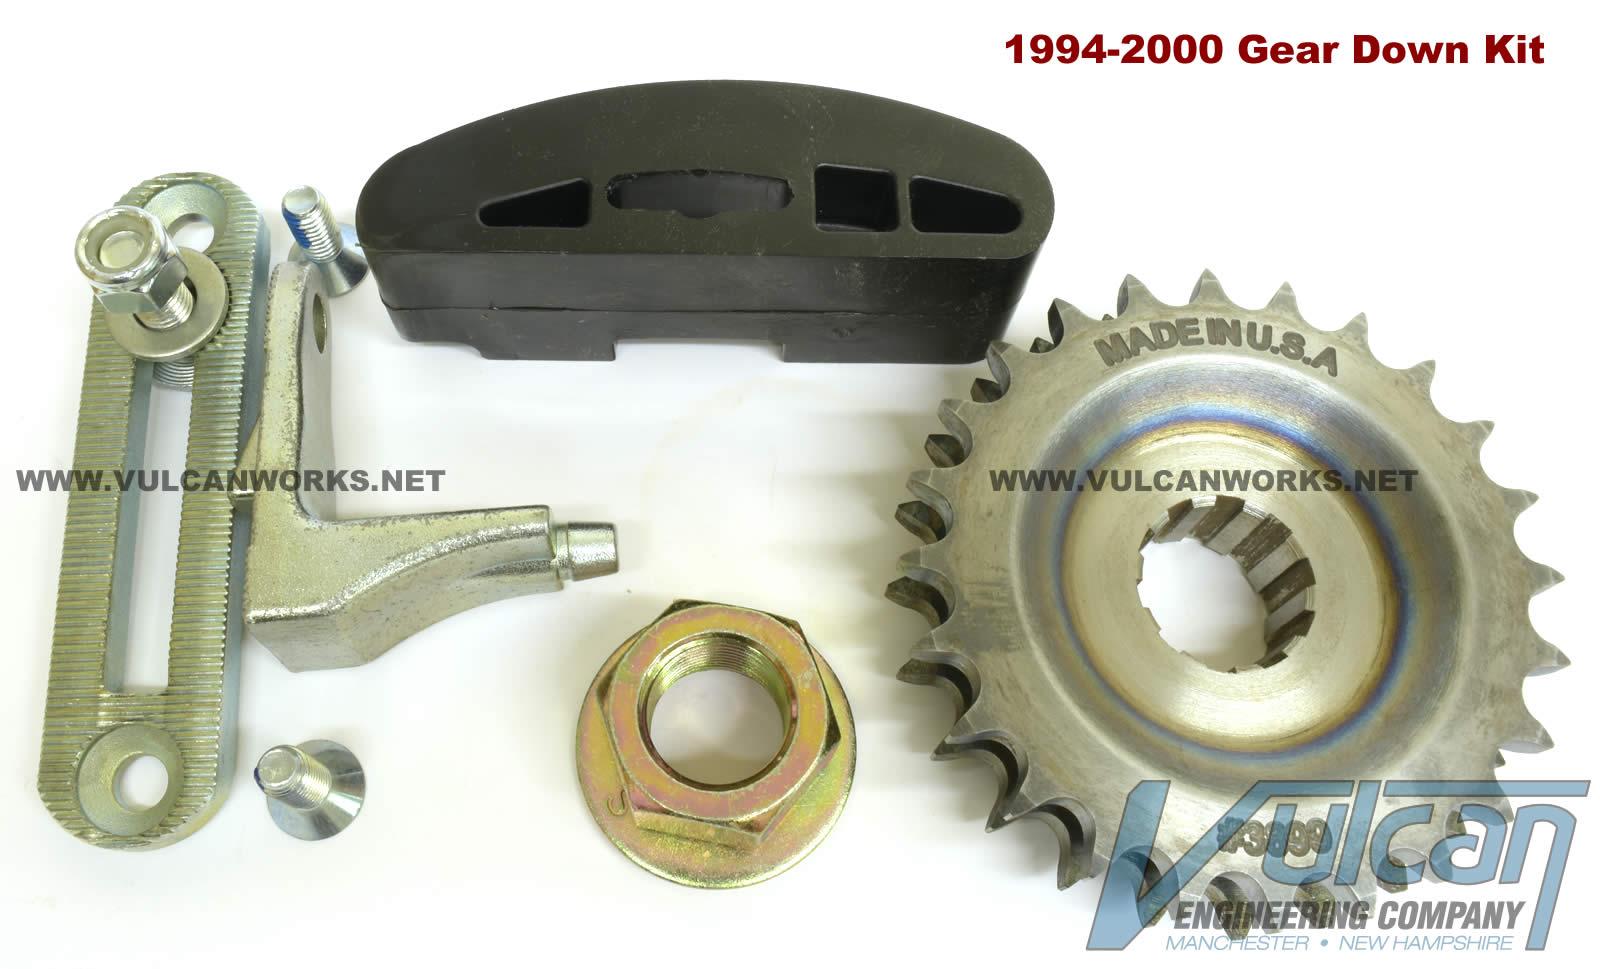 24T Compensator Eliminator Gear Down Kit for 1994-06 Bikes